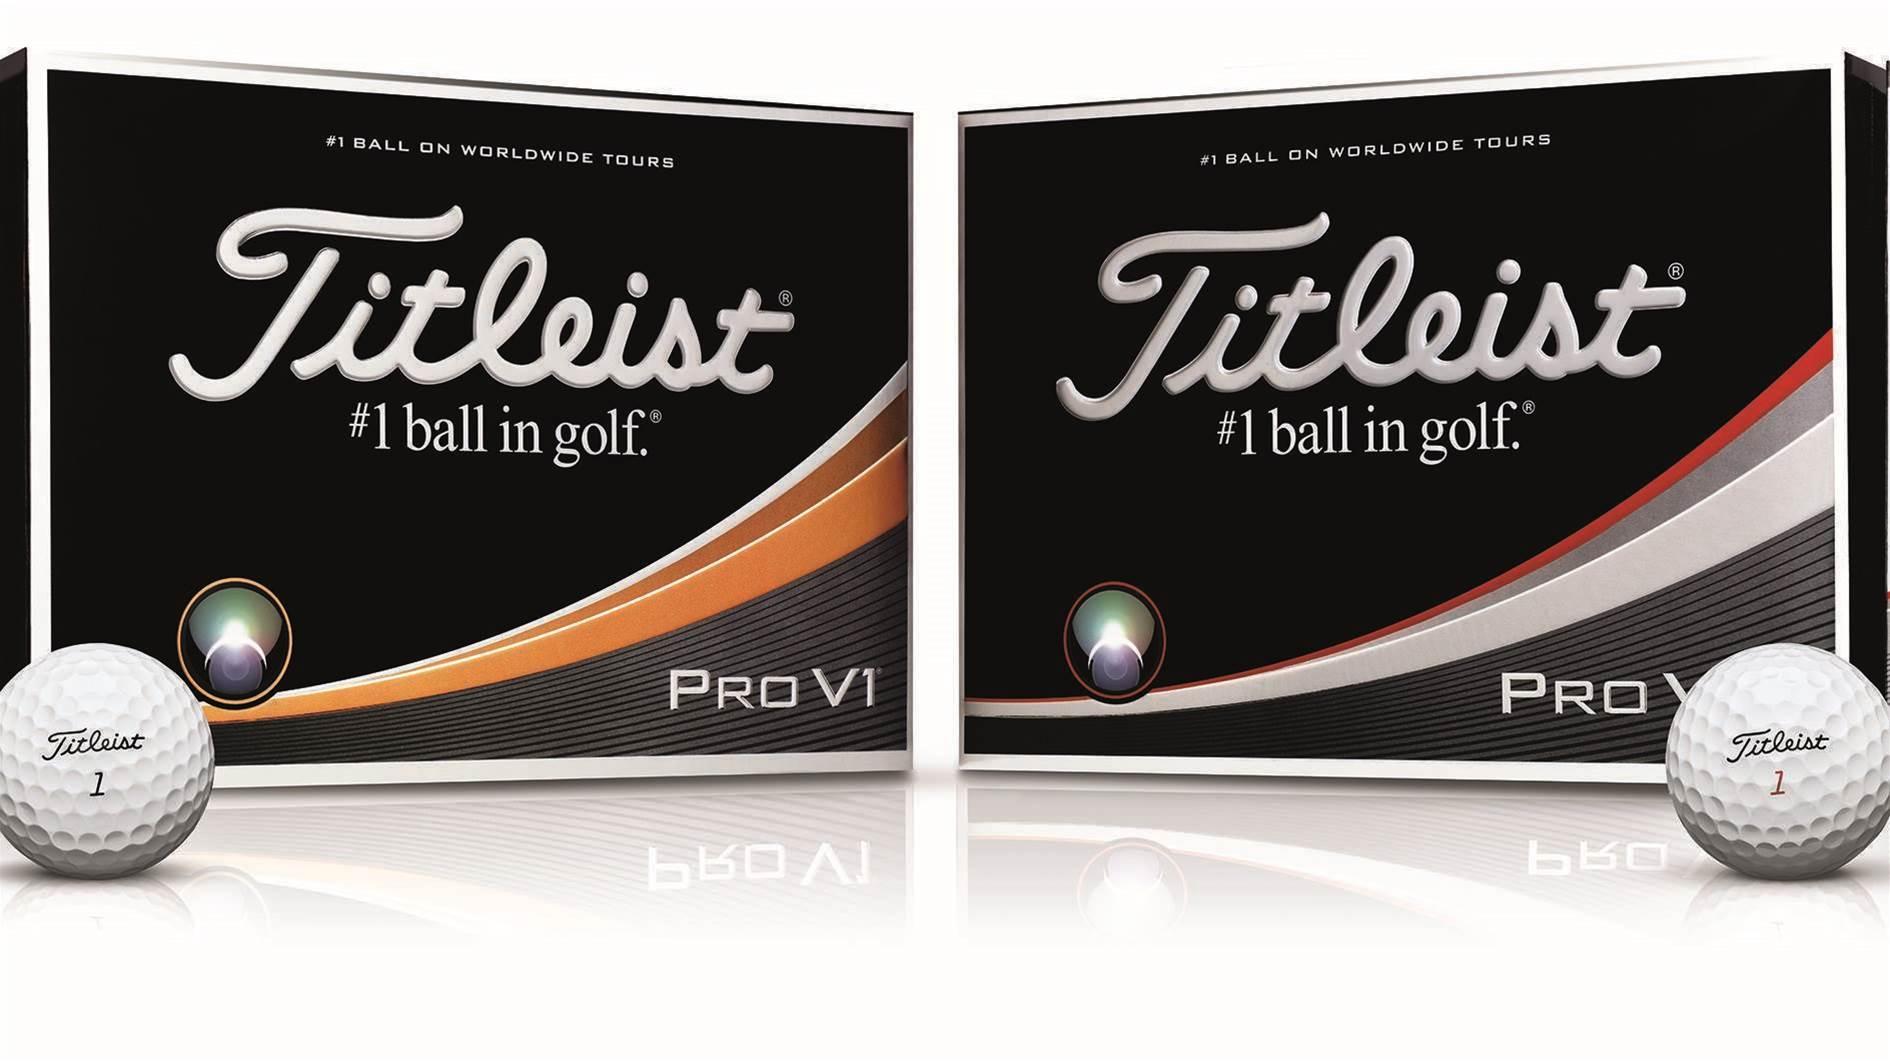 TESTED: Titleist Pro V1 & Pro V1x balls